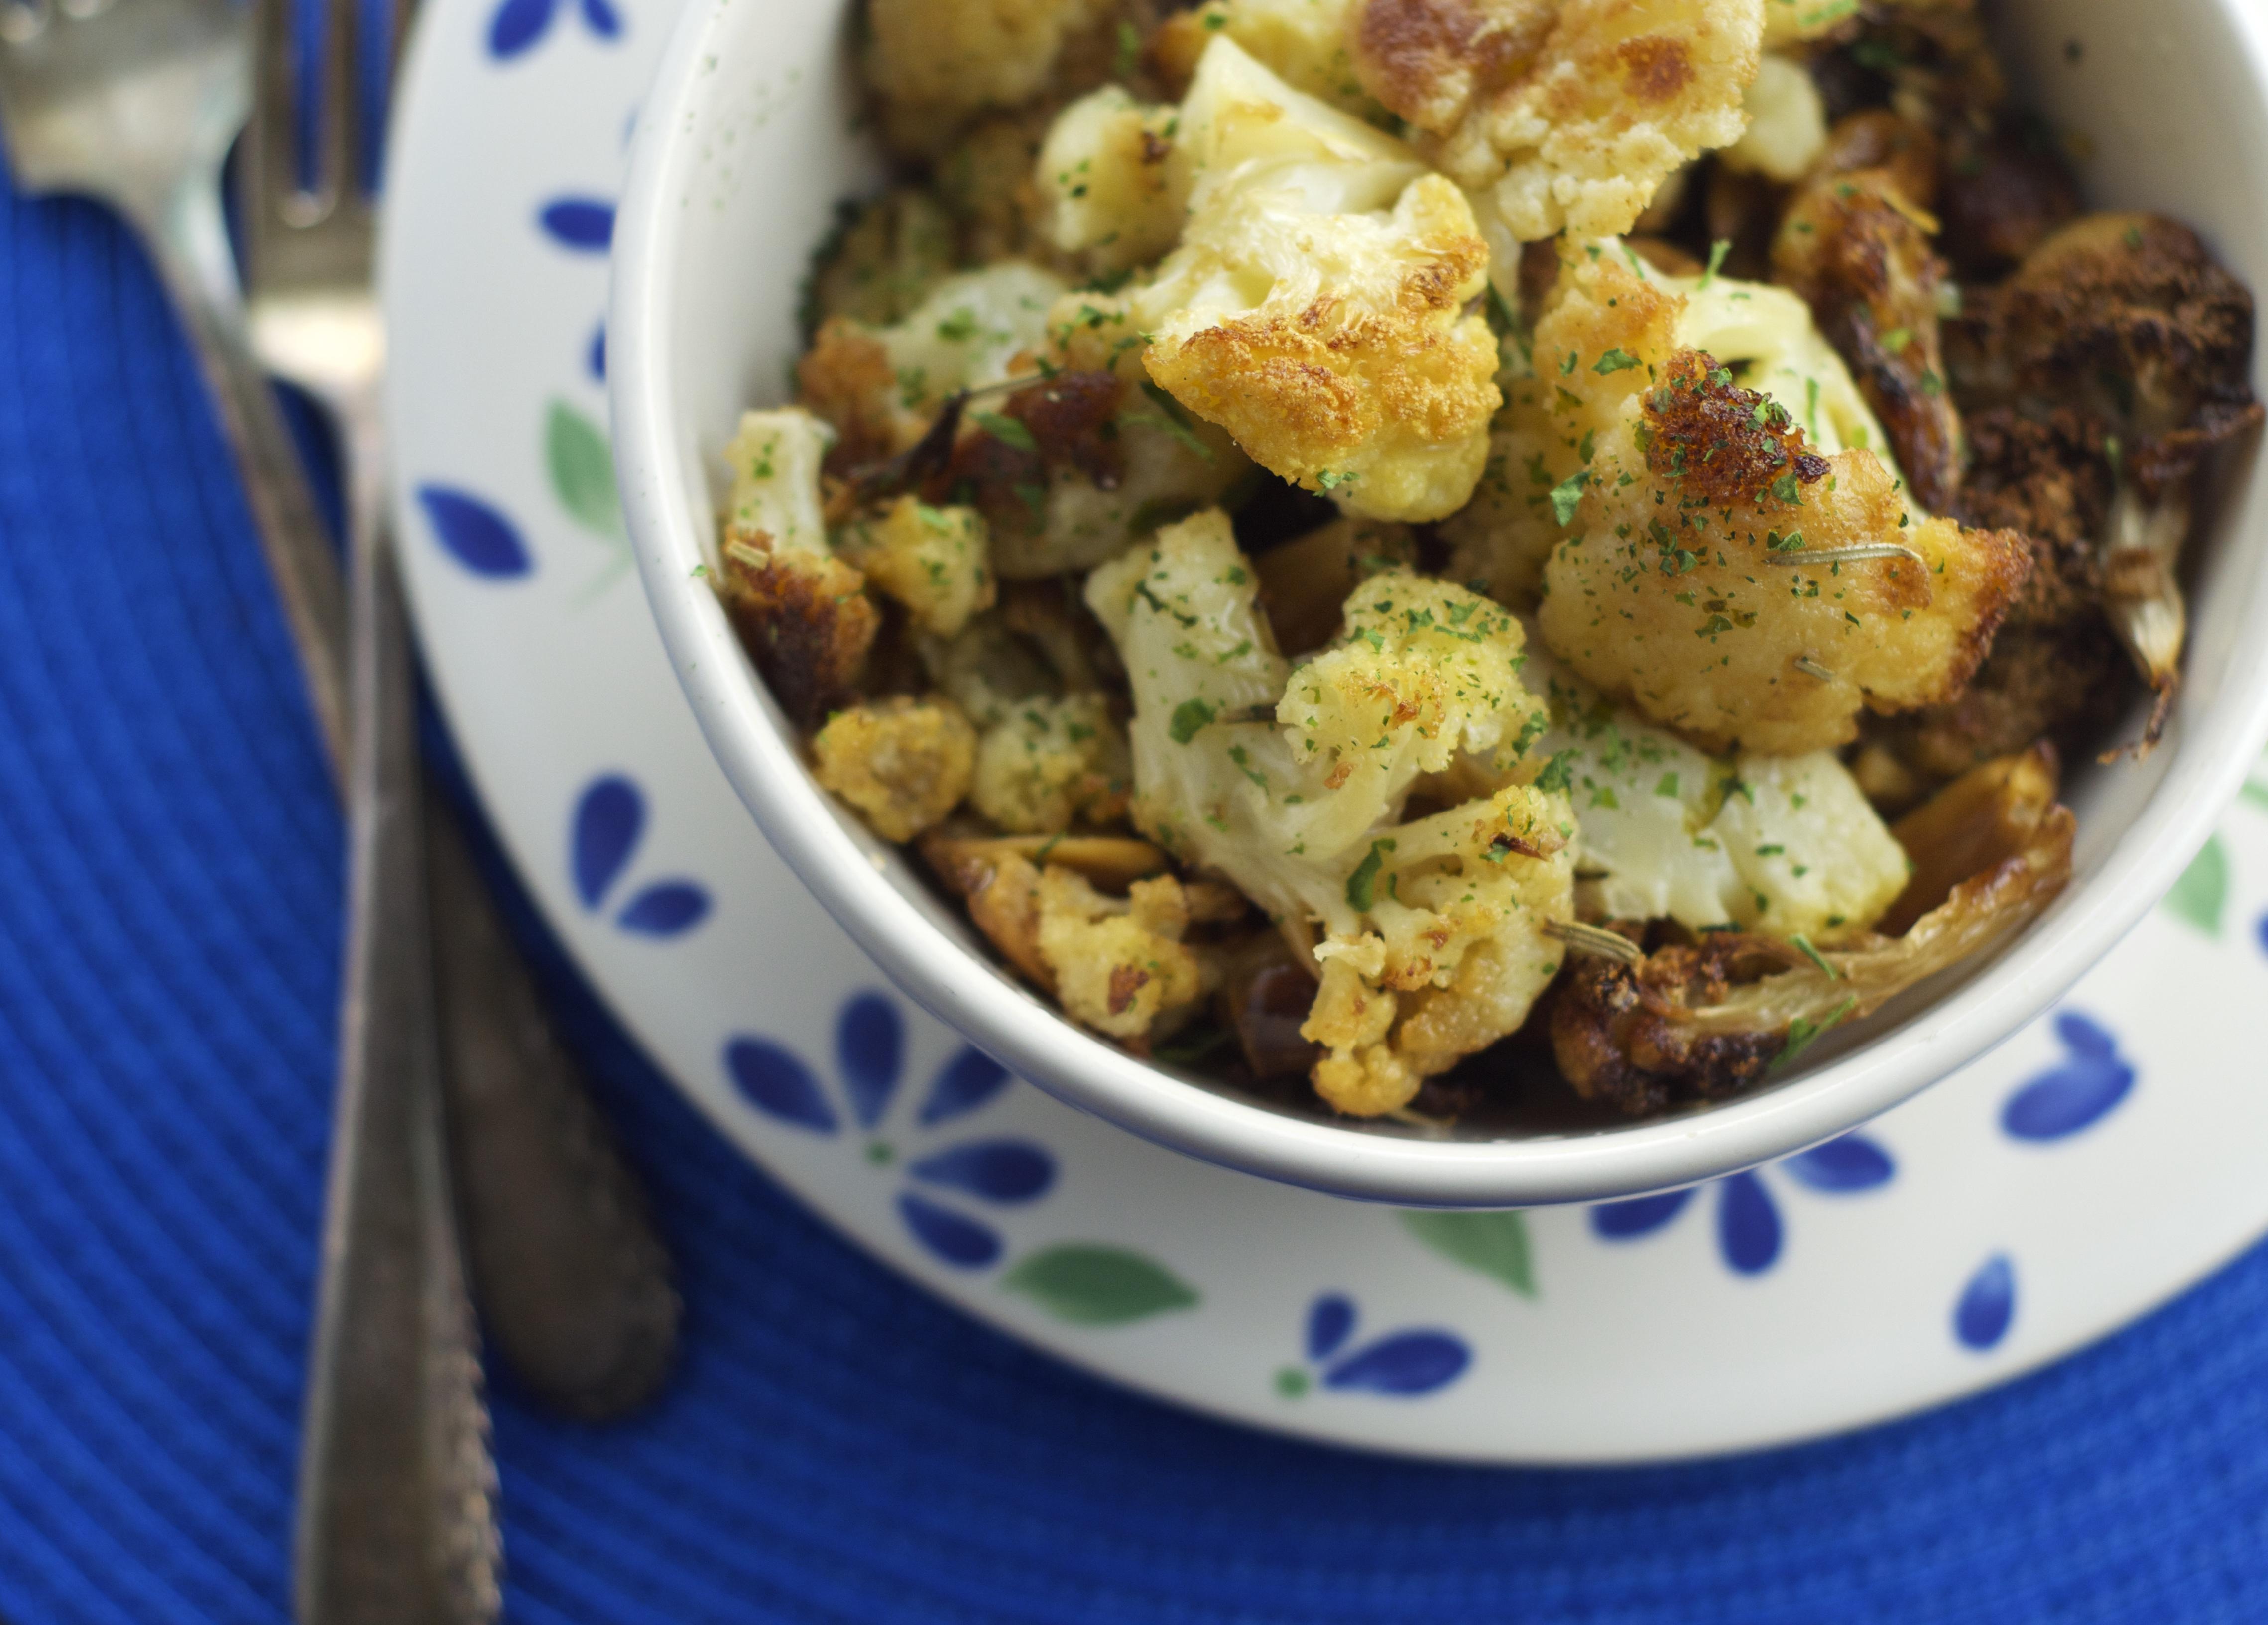 Roasted Cauliflower & 16 Roasted Cloves of Garlic